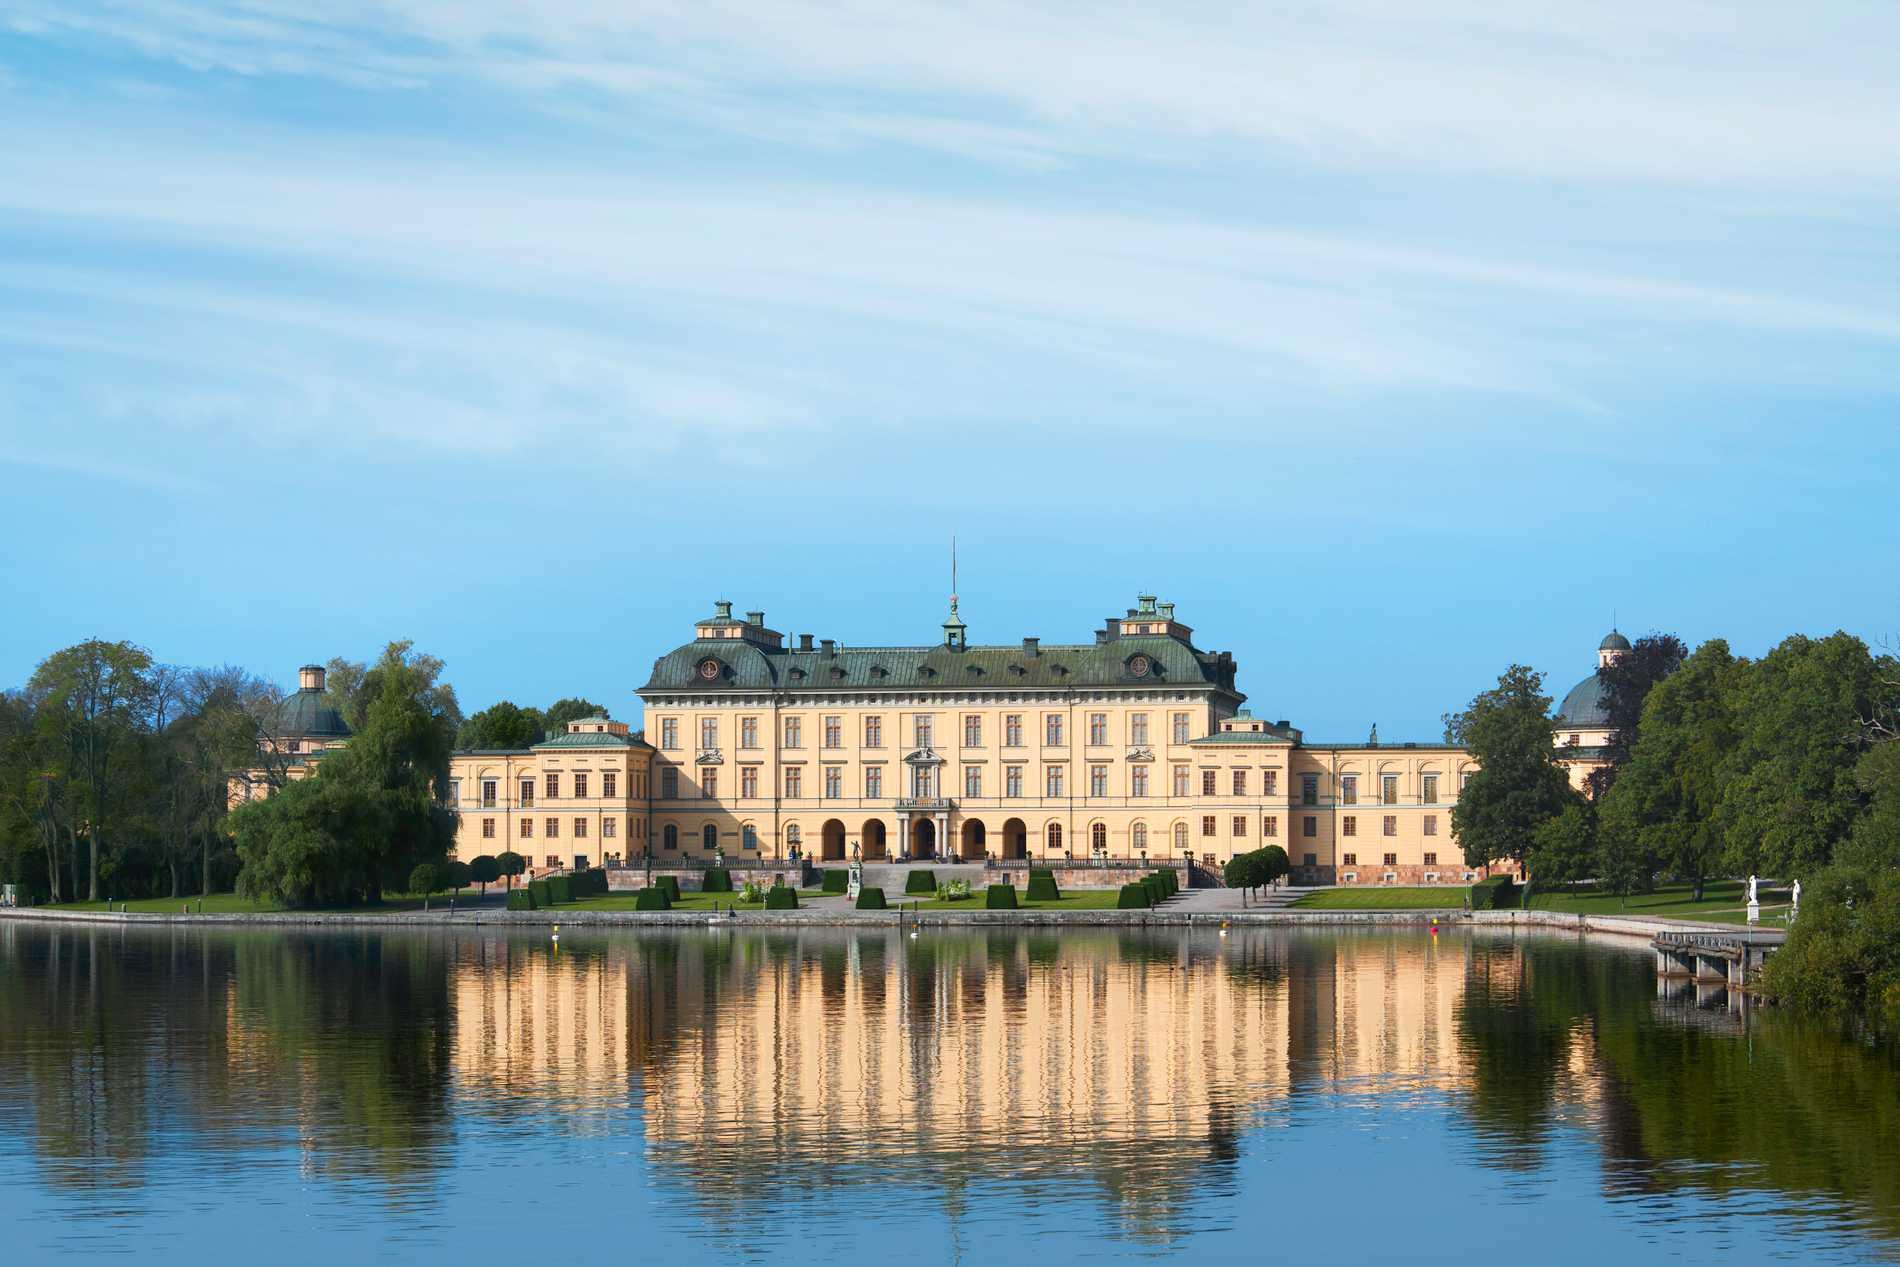 Drottningholms slott.